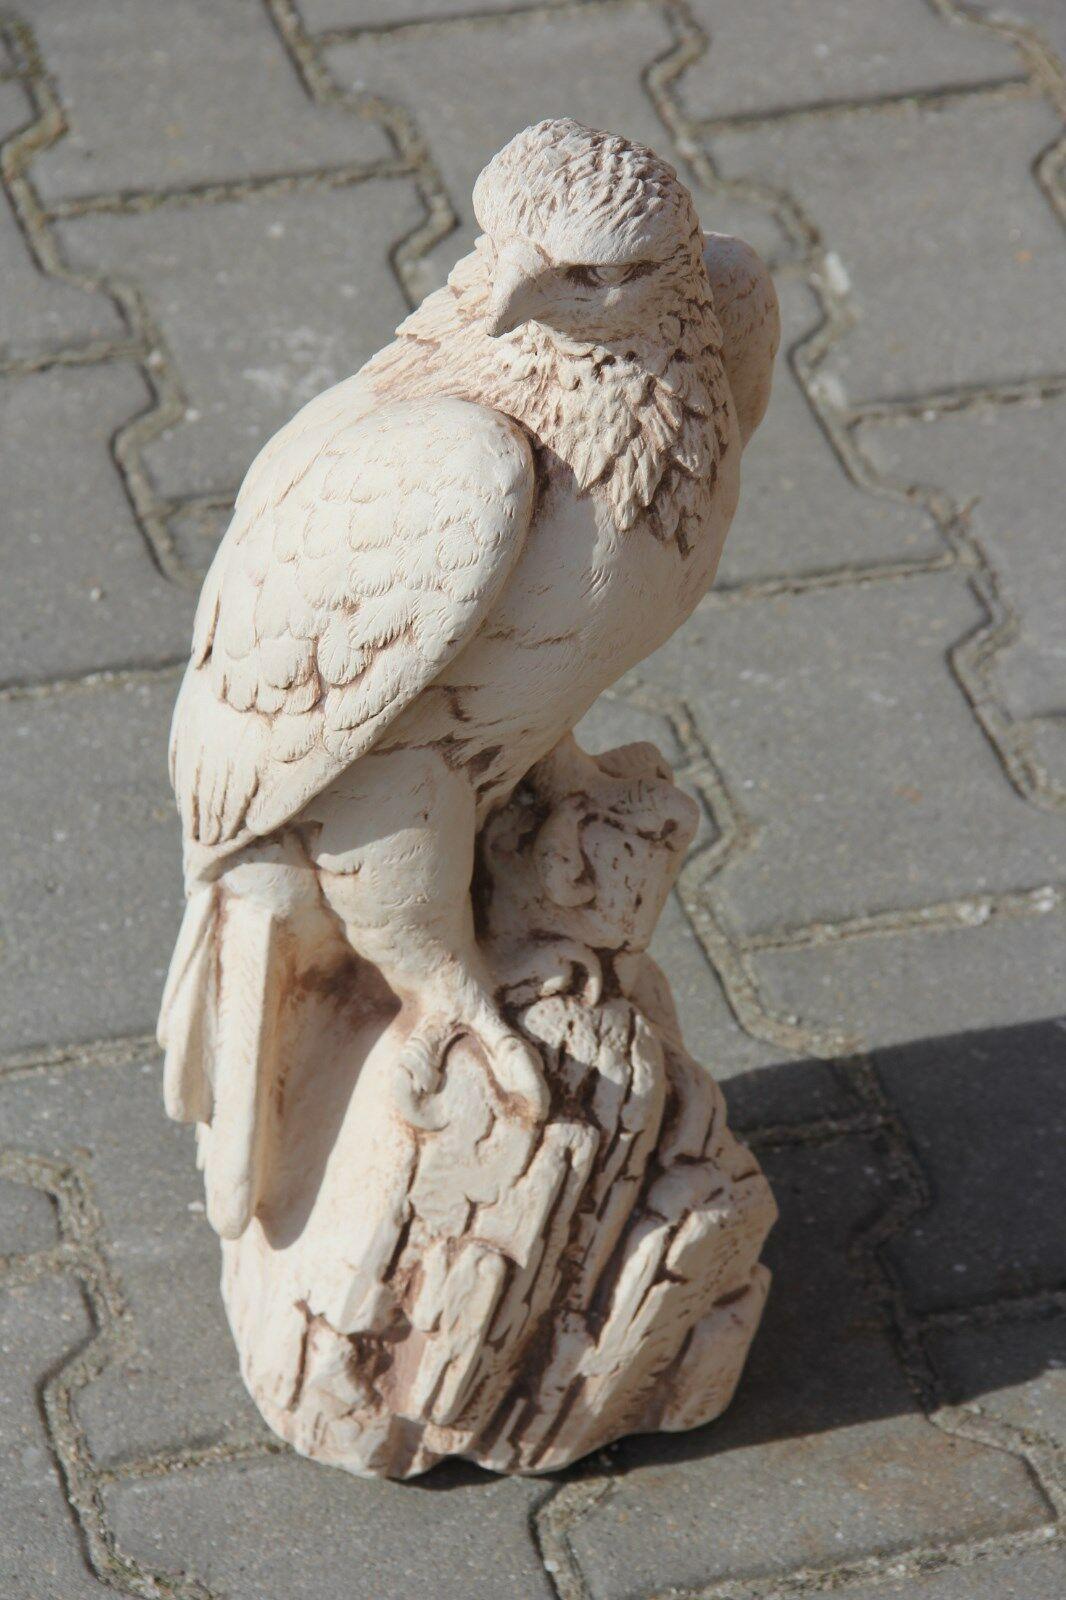 Gartendeko Vogel Luxus Gartendeko Vogel Farbe Adler Stein Steinfigur Massive